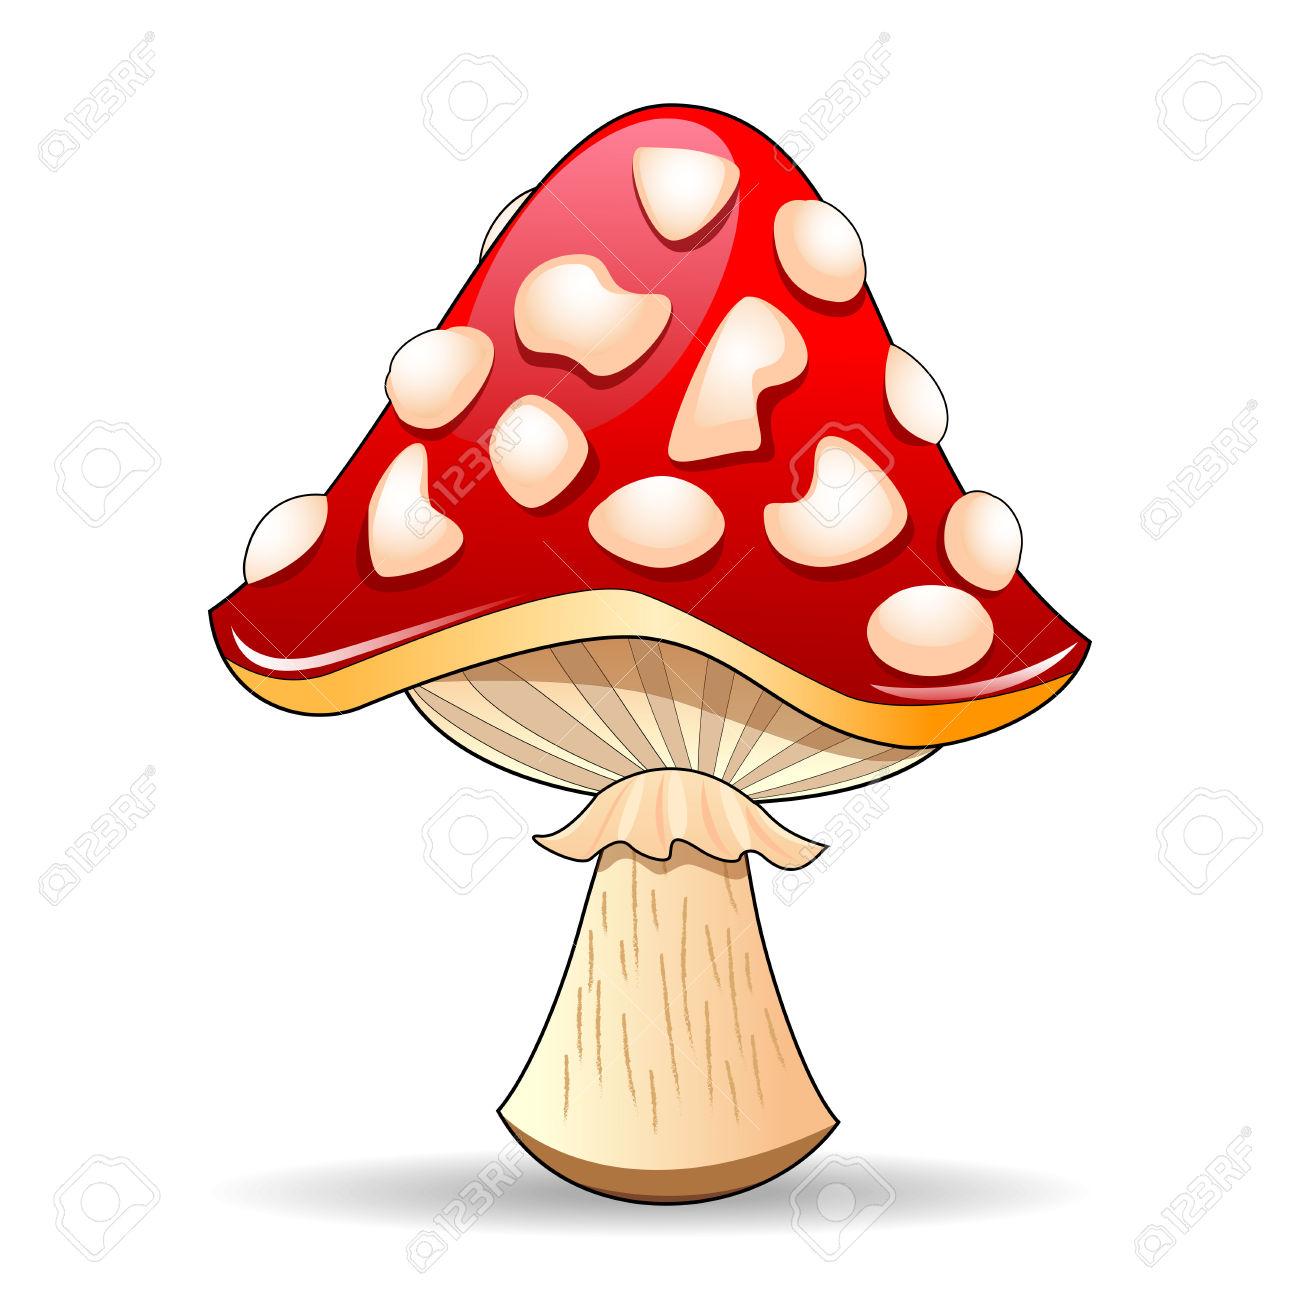 Mushroom Amanita. Spotted Red Mushroom On A White Background.